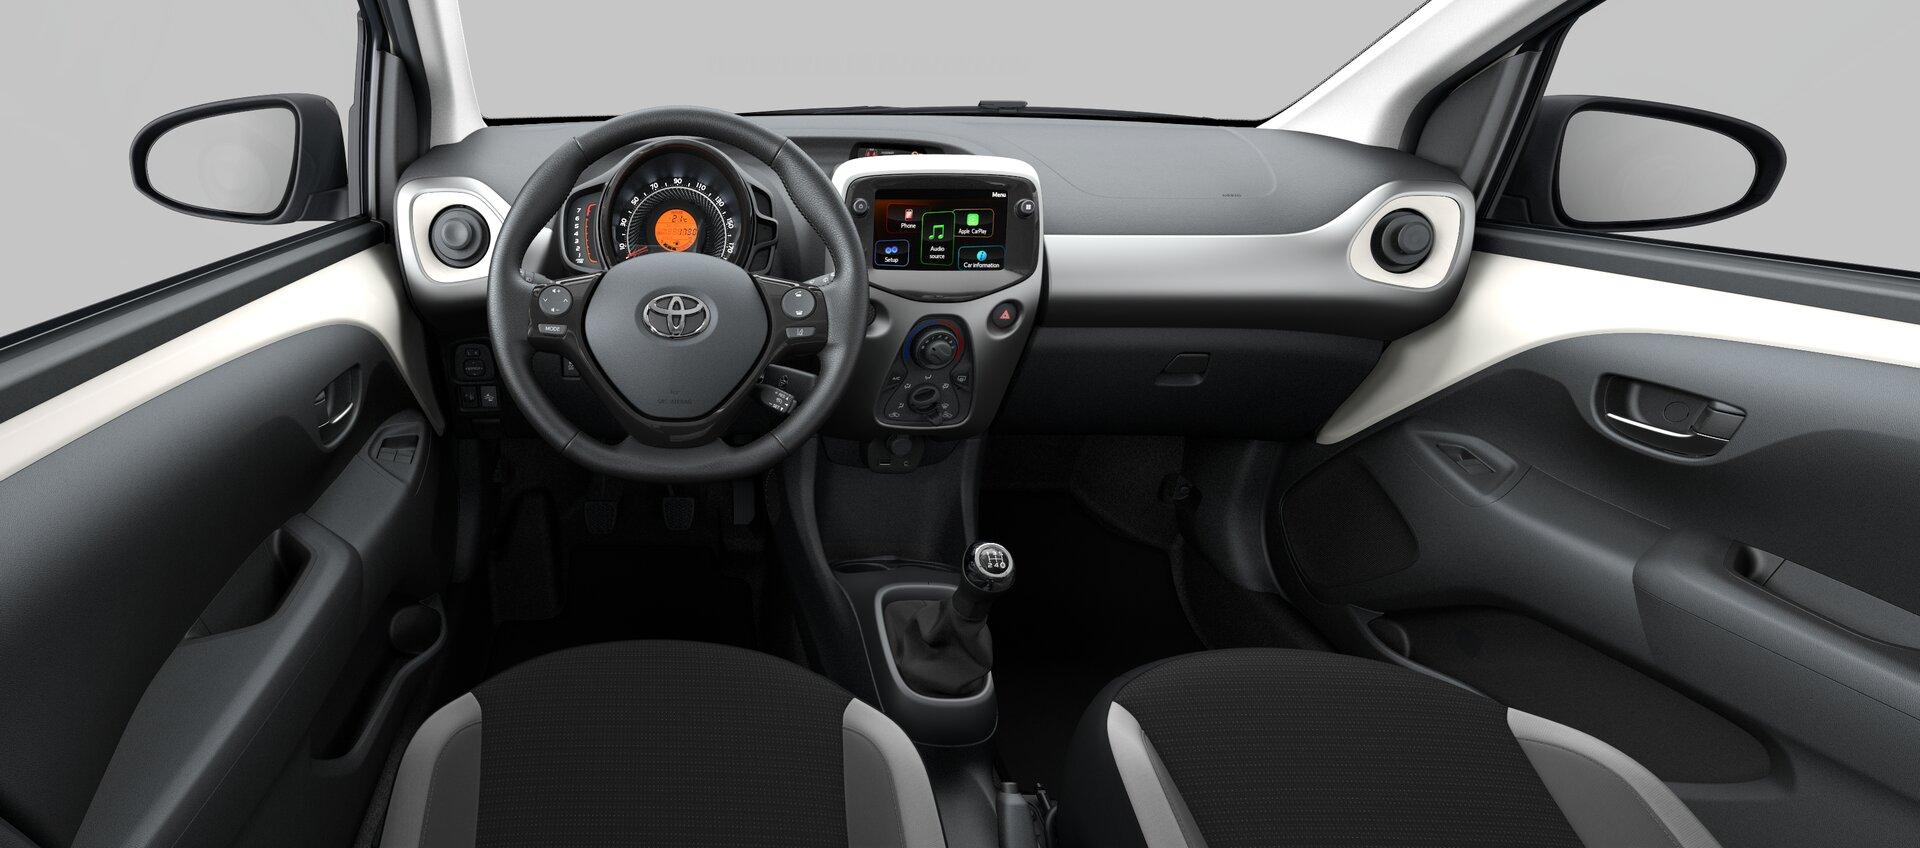 Toyota Aygo x play 2021